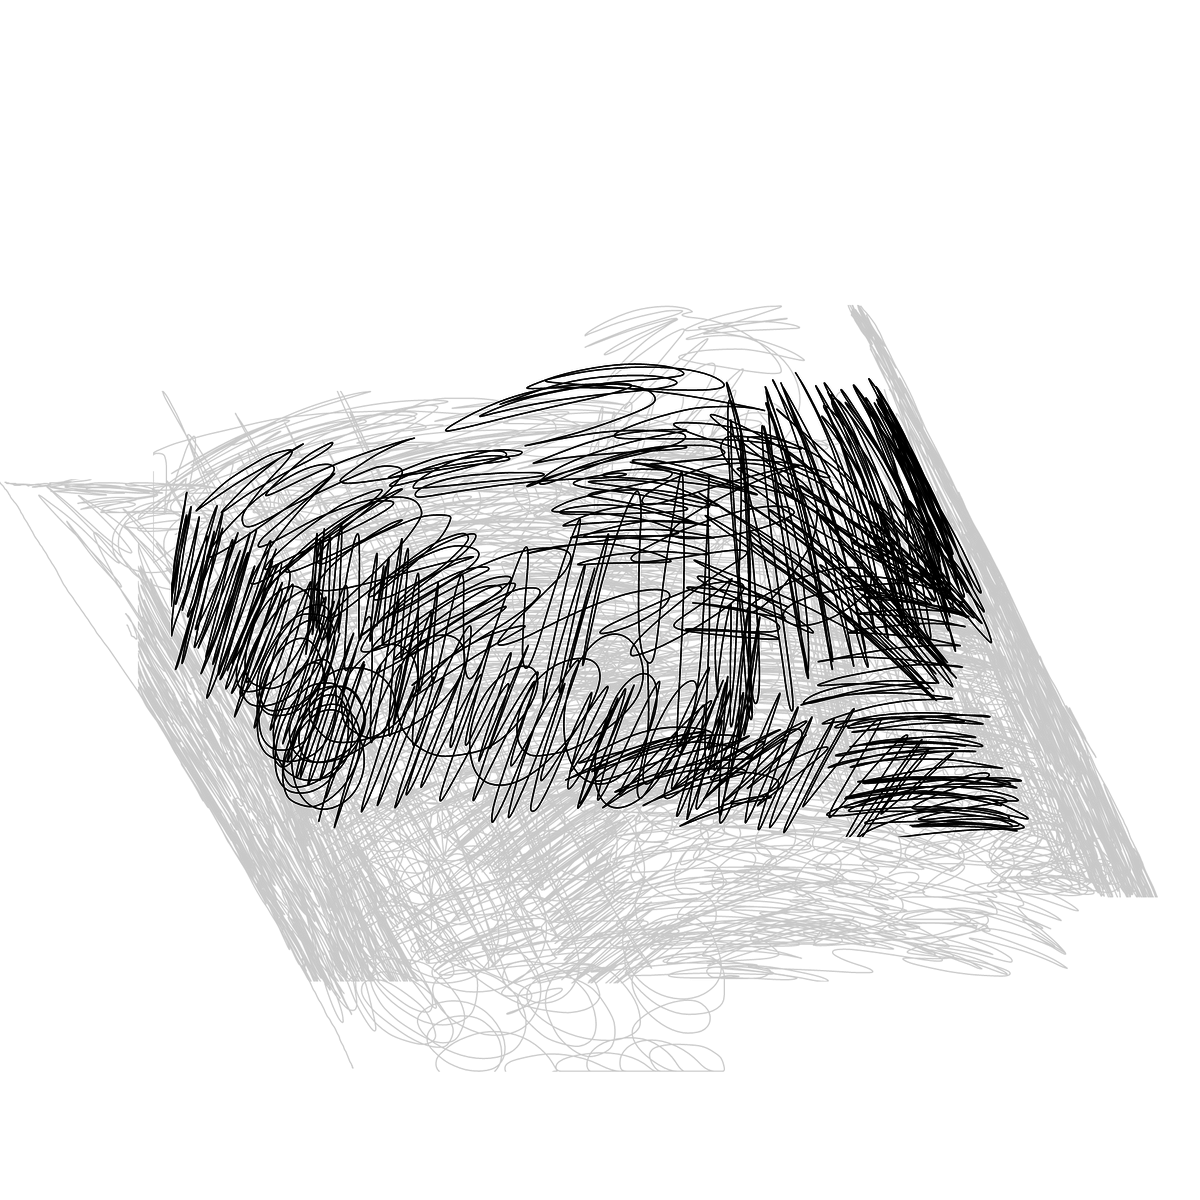 BAAAM drawing#6170 lat:52.4879722595214840lng: 13.4253416061401370